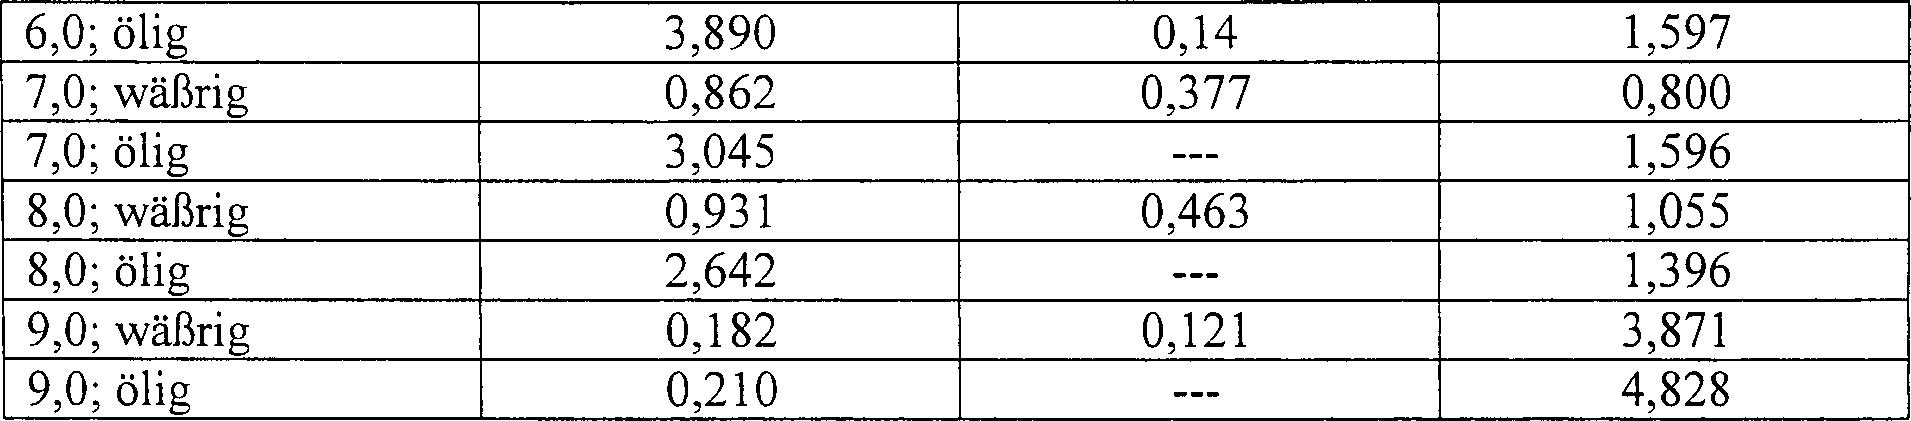 hexalacton 25 mg